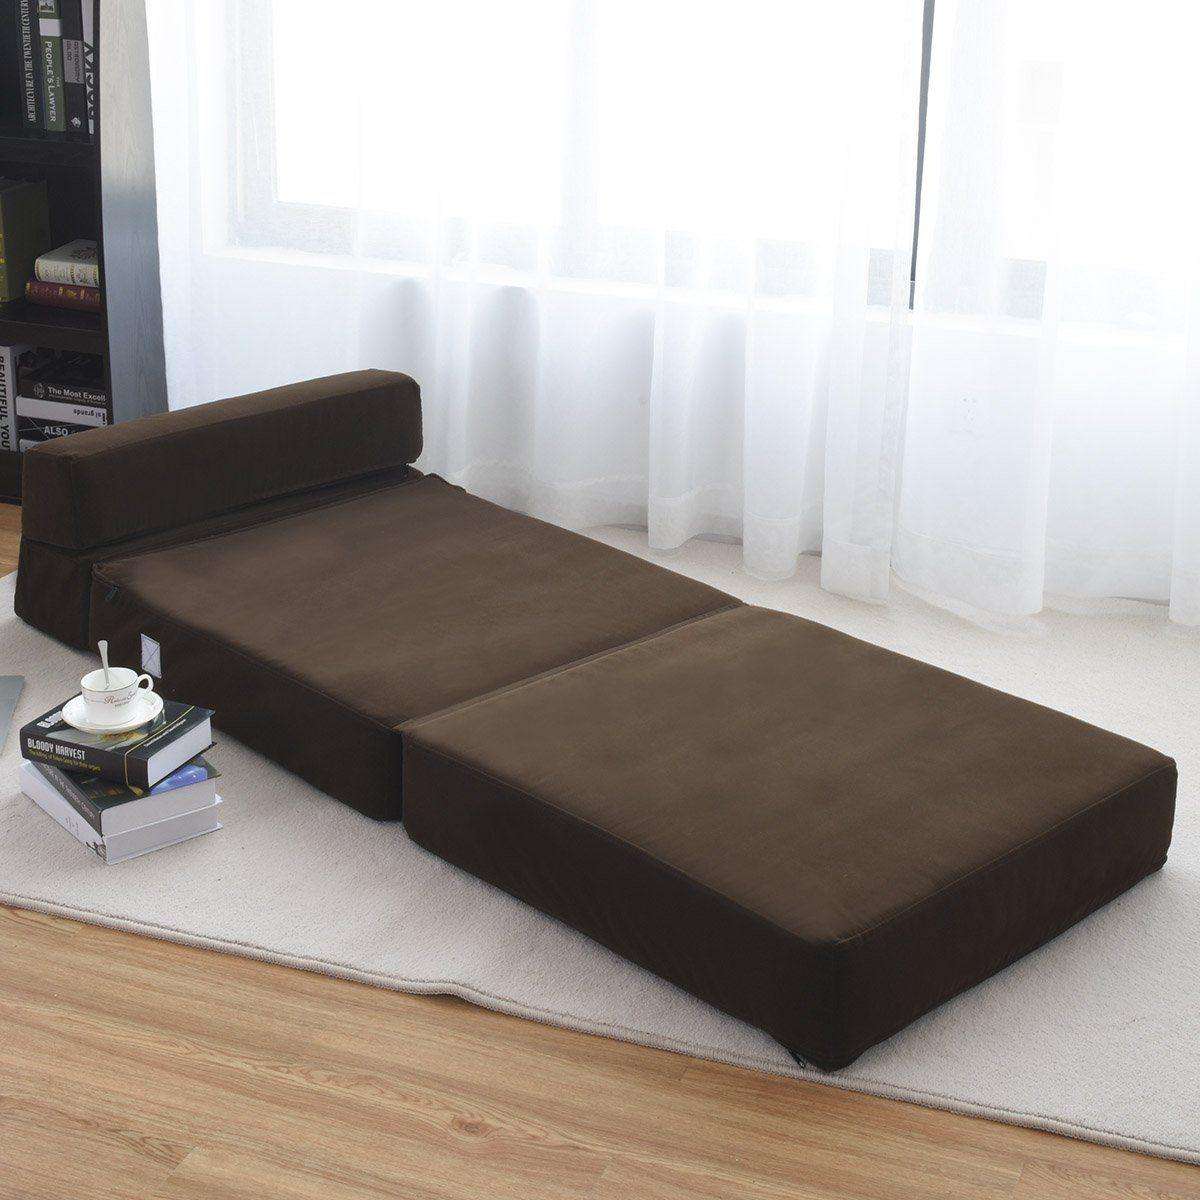 Giantex Fold Down Sofa Bed Floor Couch Foam Folding Modern Futon